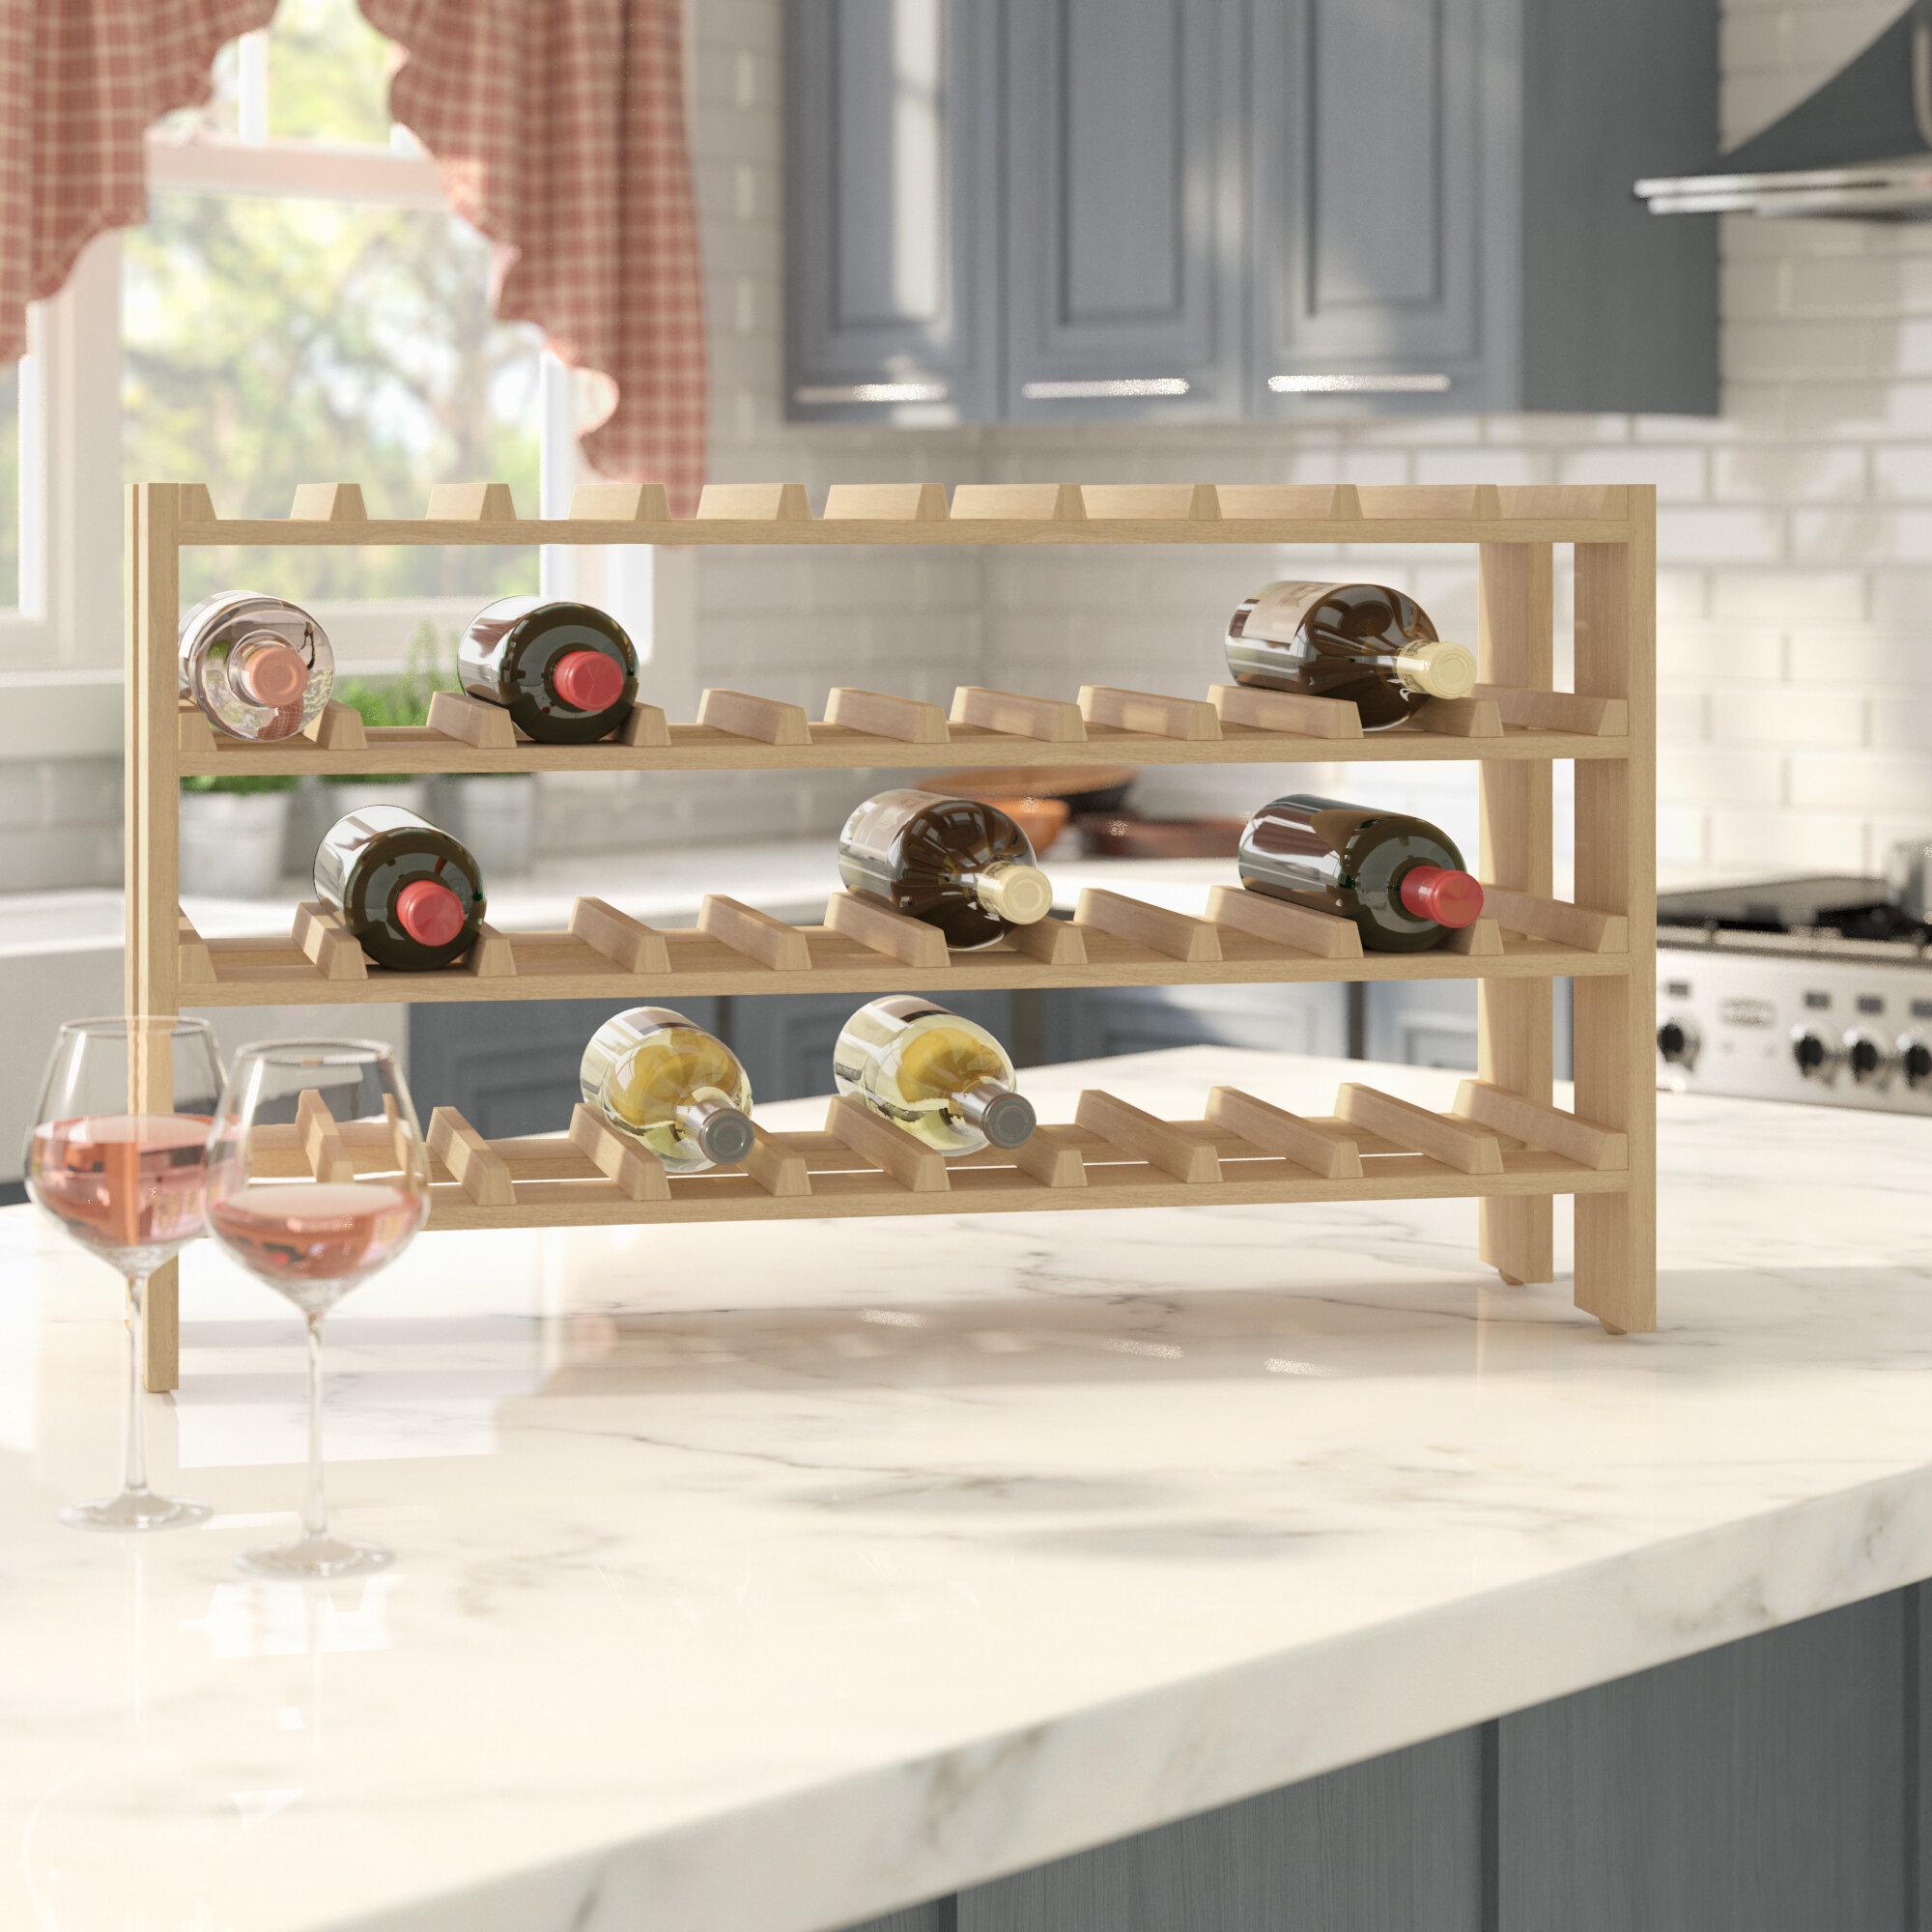 40 Bottle Floor Wine Rack Racks Storage You Ll Love Wayfair. Marvellous  Design Gold ...